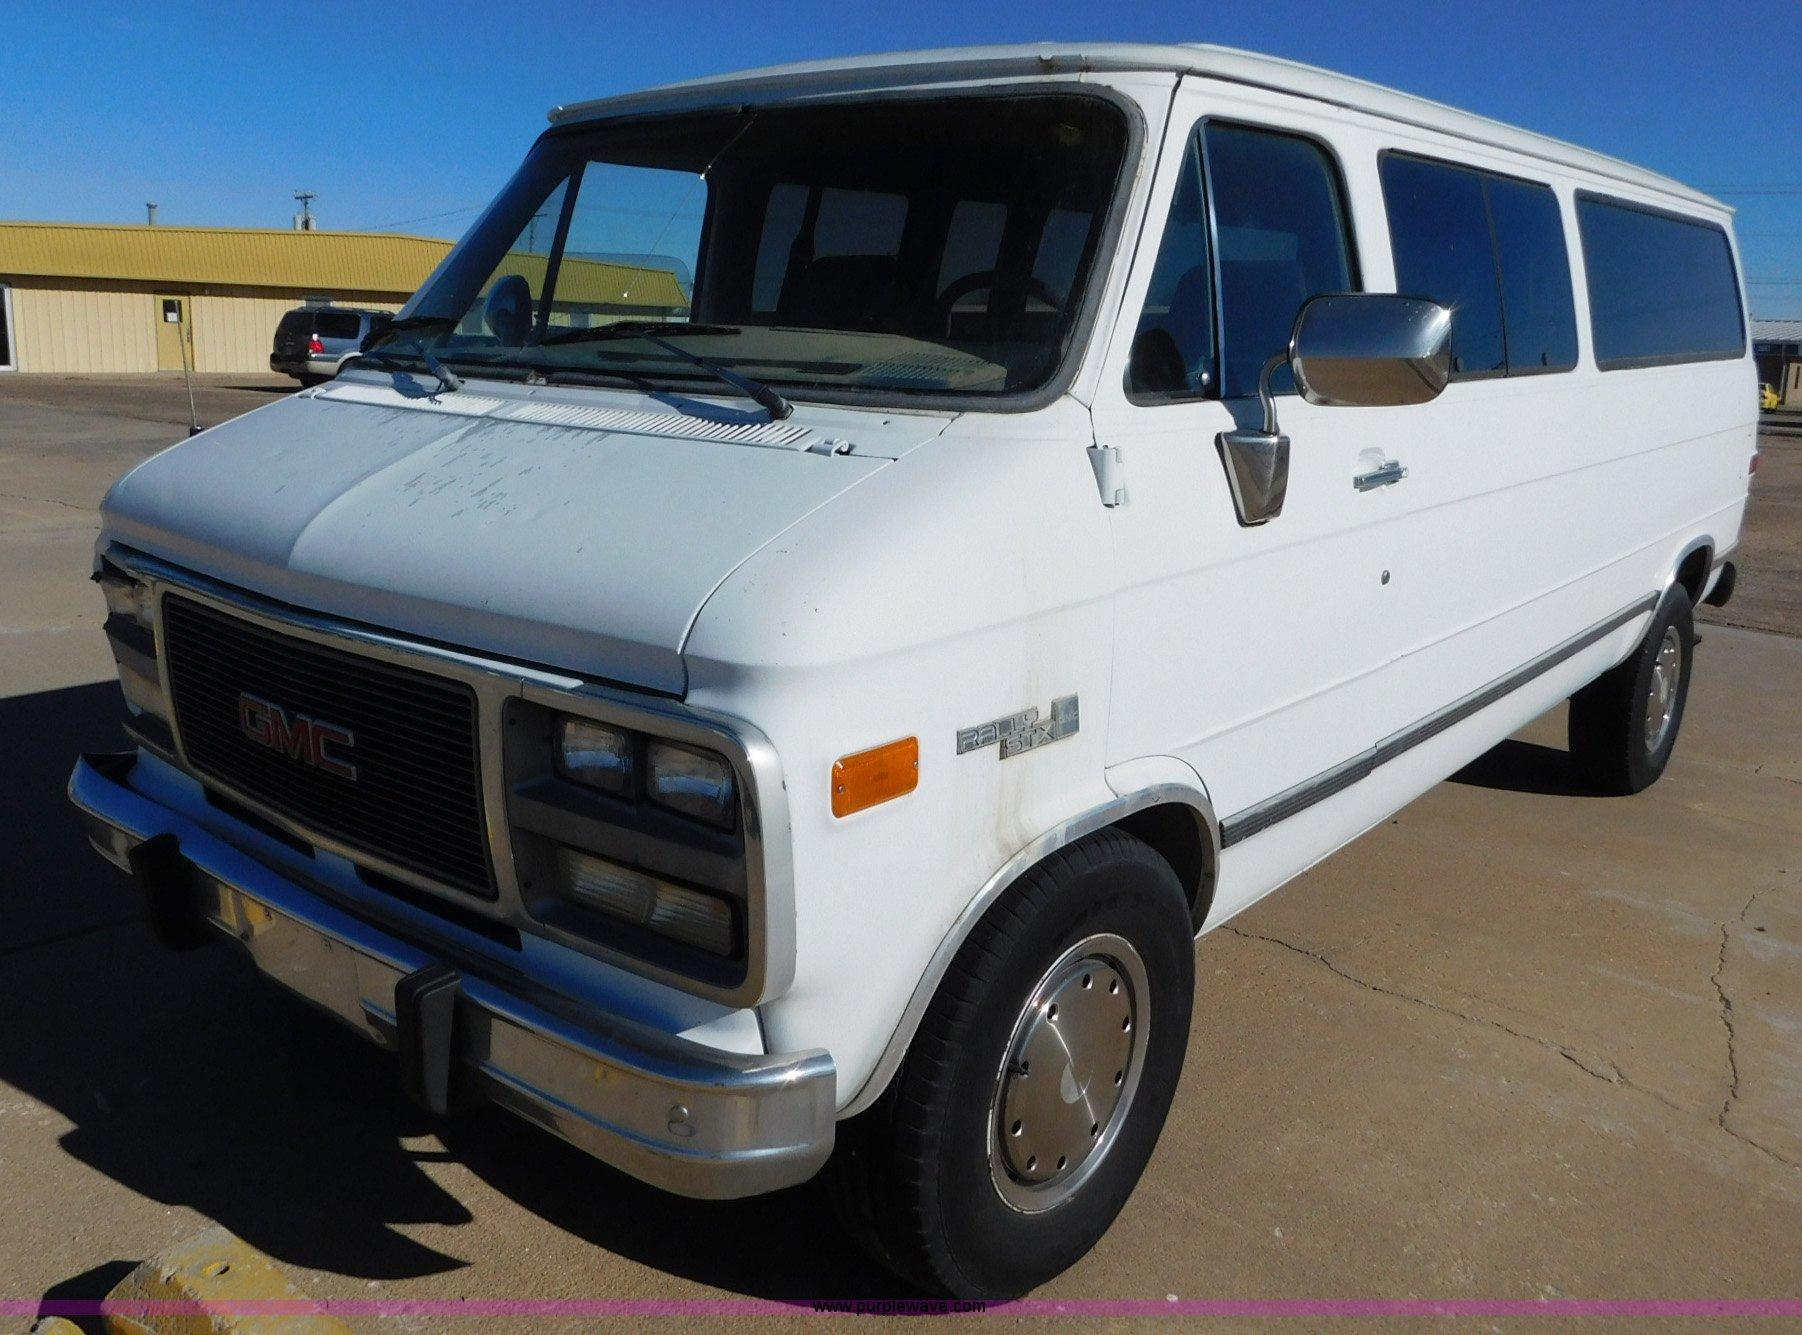 hight resolution of  1992 gmc rally 3500 van full size in new window